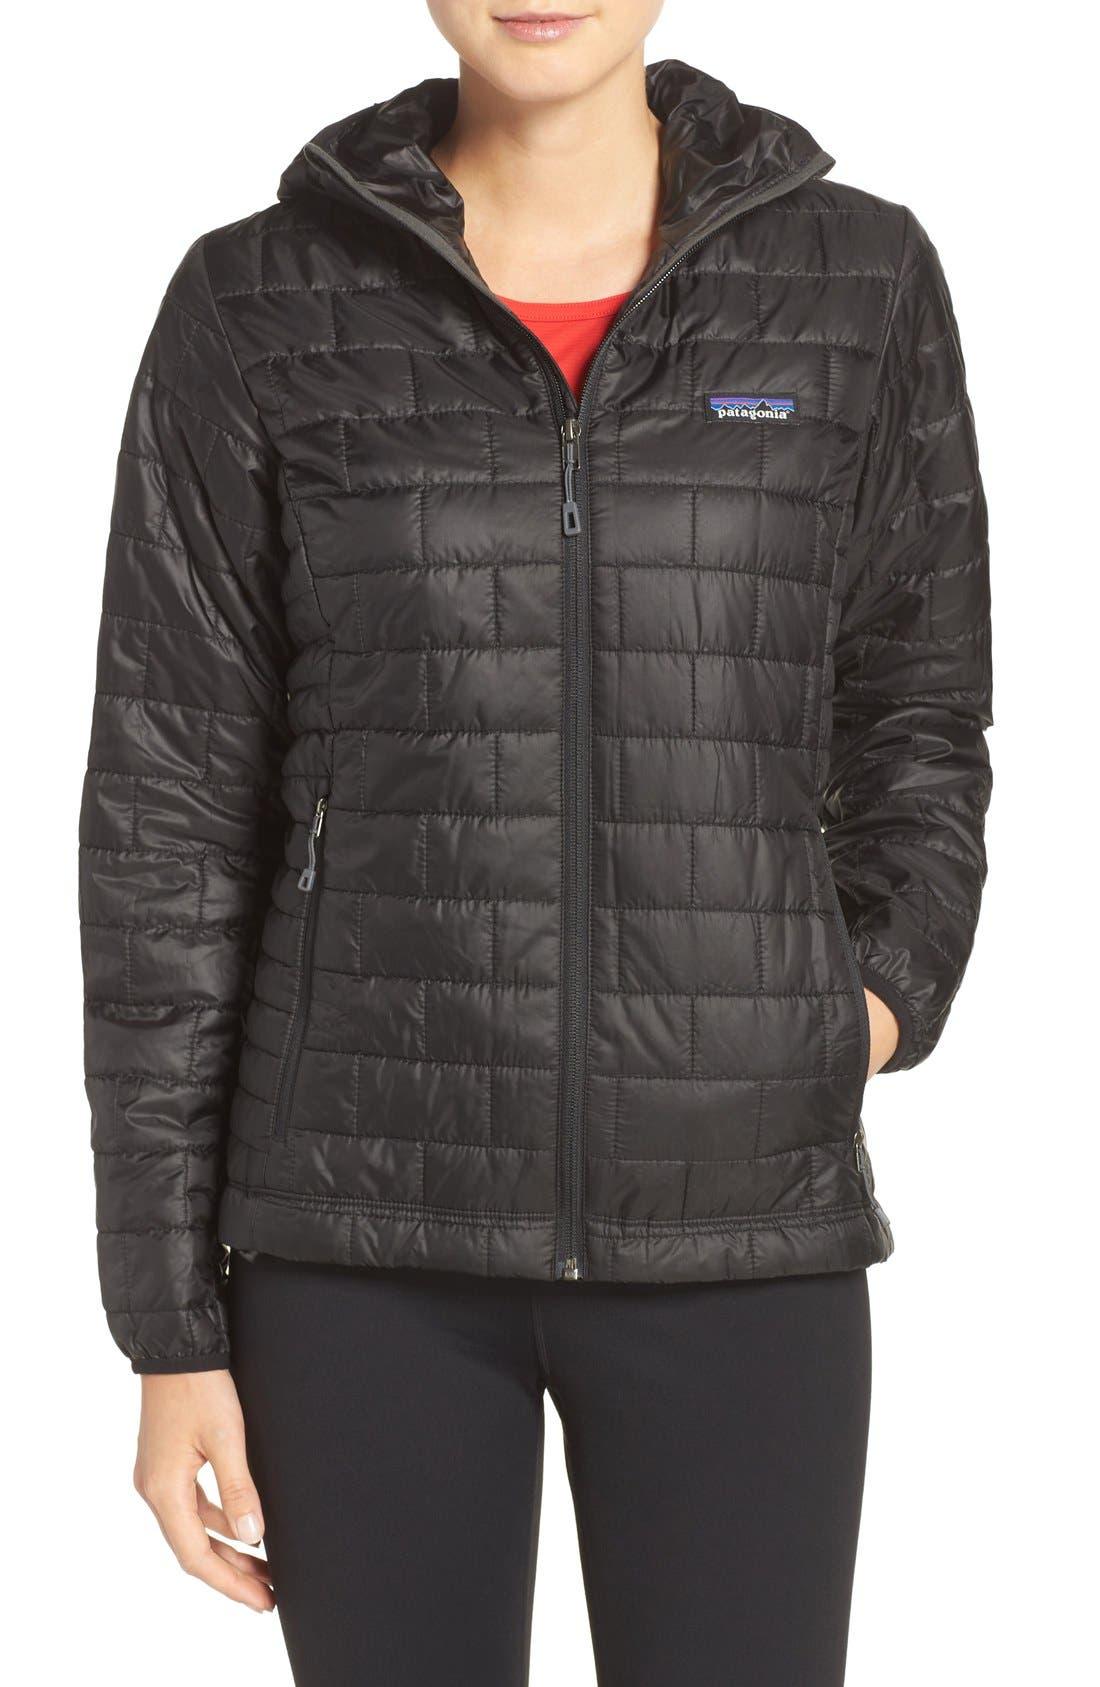 Patagonia Nano Puff Hooded Water Resistant Jacket, Black